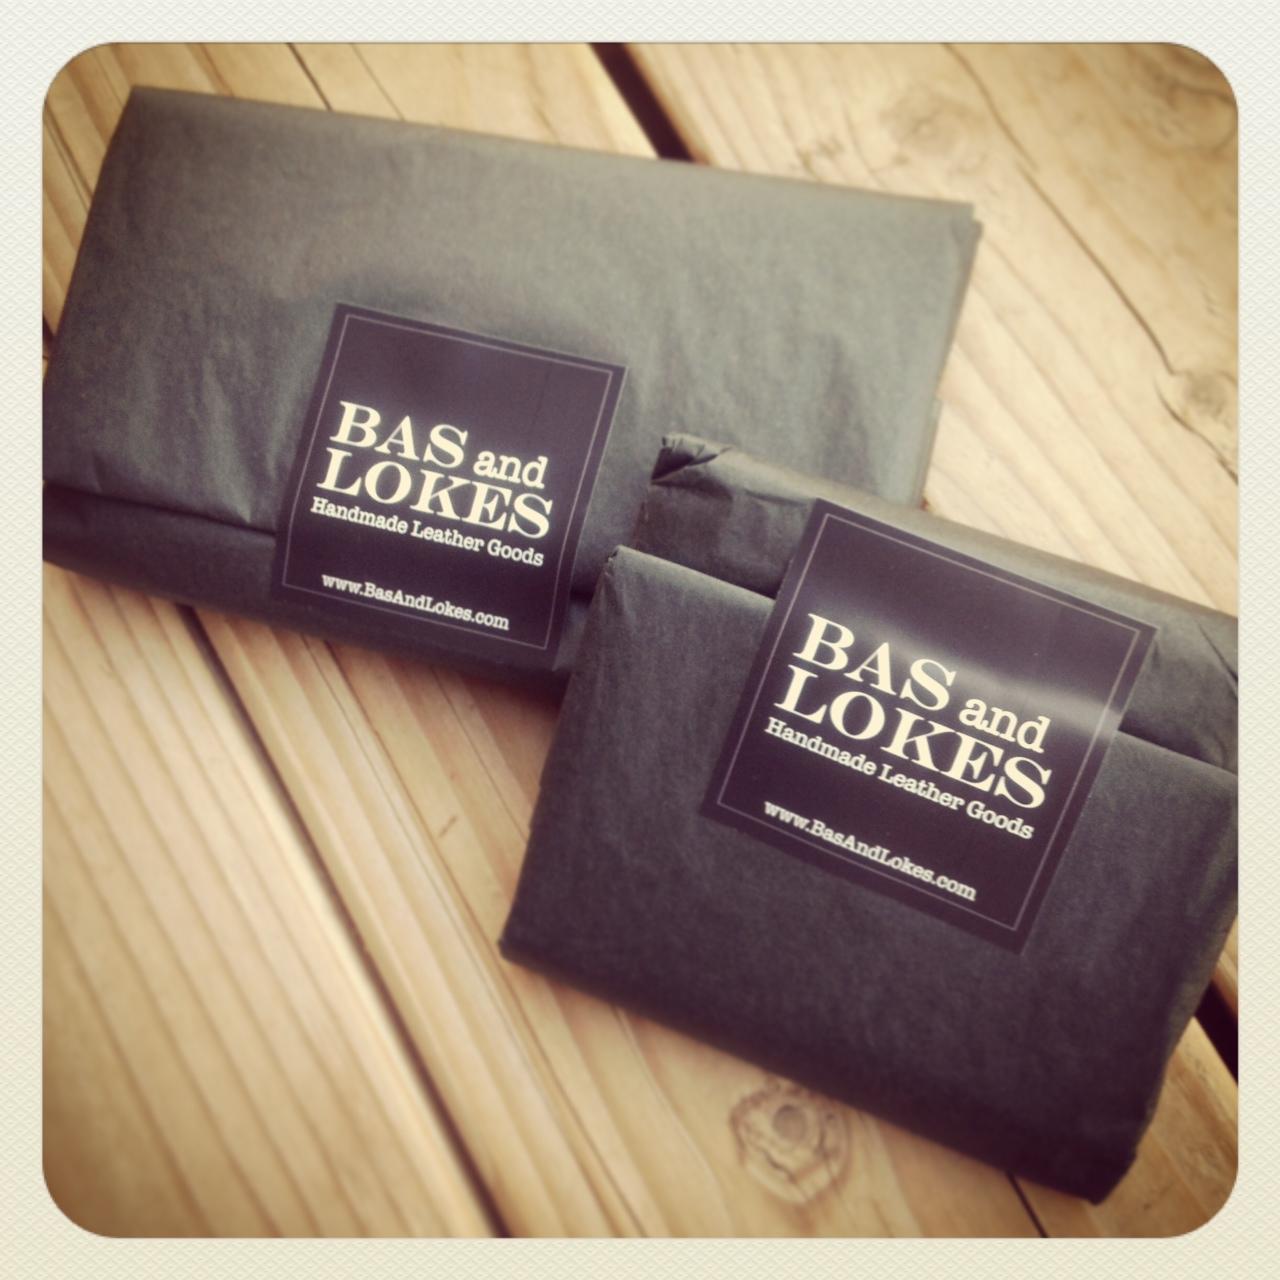 Such posh packaging! (recent   Instagram   post)